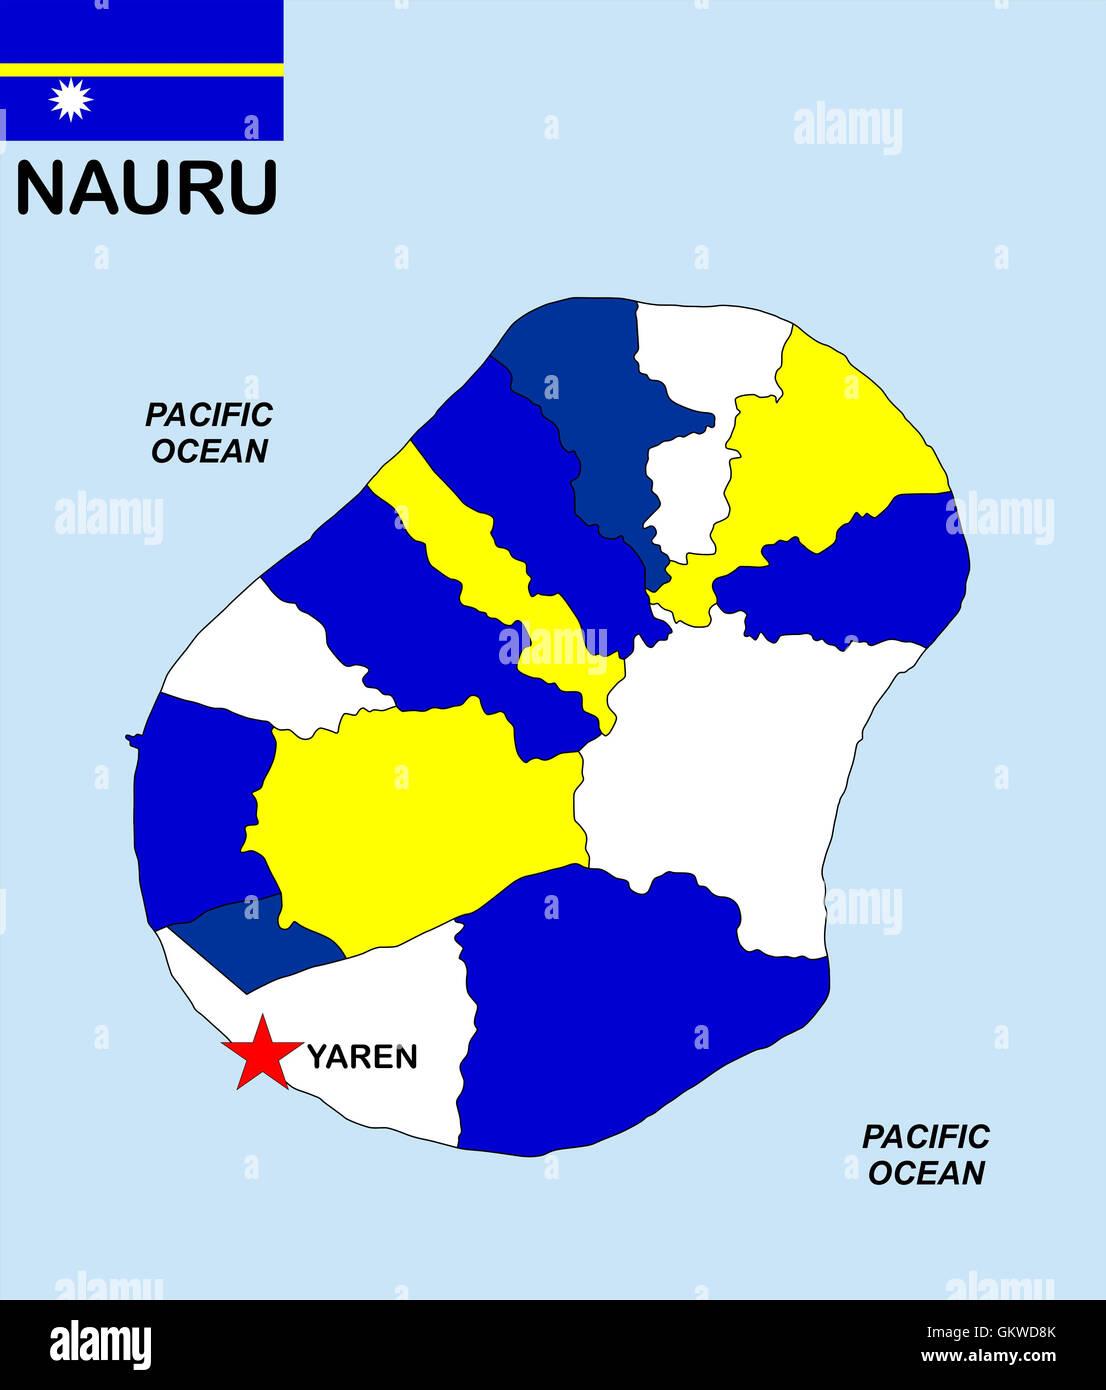 nauru map Stock Photo: 115499907 - Alamy on tuvalu map, east timor map, saint kitts and nevis map, libya map, mauritius map, kiribati map, monaco map, liechtenstein map, morocco map, wake island map, new caledonia map, rwanda map, liberia map, algeria map, mauritania map, mozambique map, papua nueva guinea map, kenya map, congo map, senegal map, zimbabwe map, malawi map, new zealand map, sudan map, madagascar map, the marshall islands map, niue map, ghana map, mali map, namibia map, burundi map, saint pierre and miquelon map, tunisia map, angola map, niger map, timor-leste map, solomon islands map, cook islands map, netherlands map, oceania map,